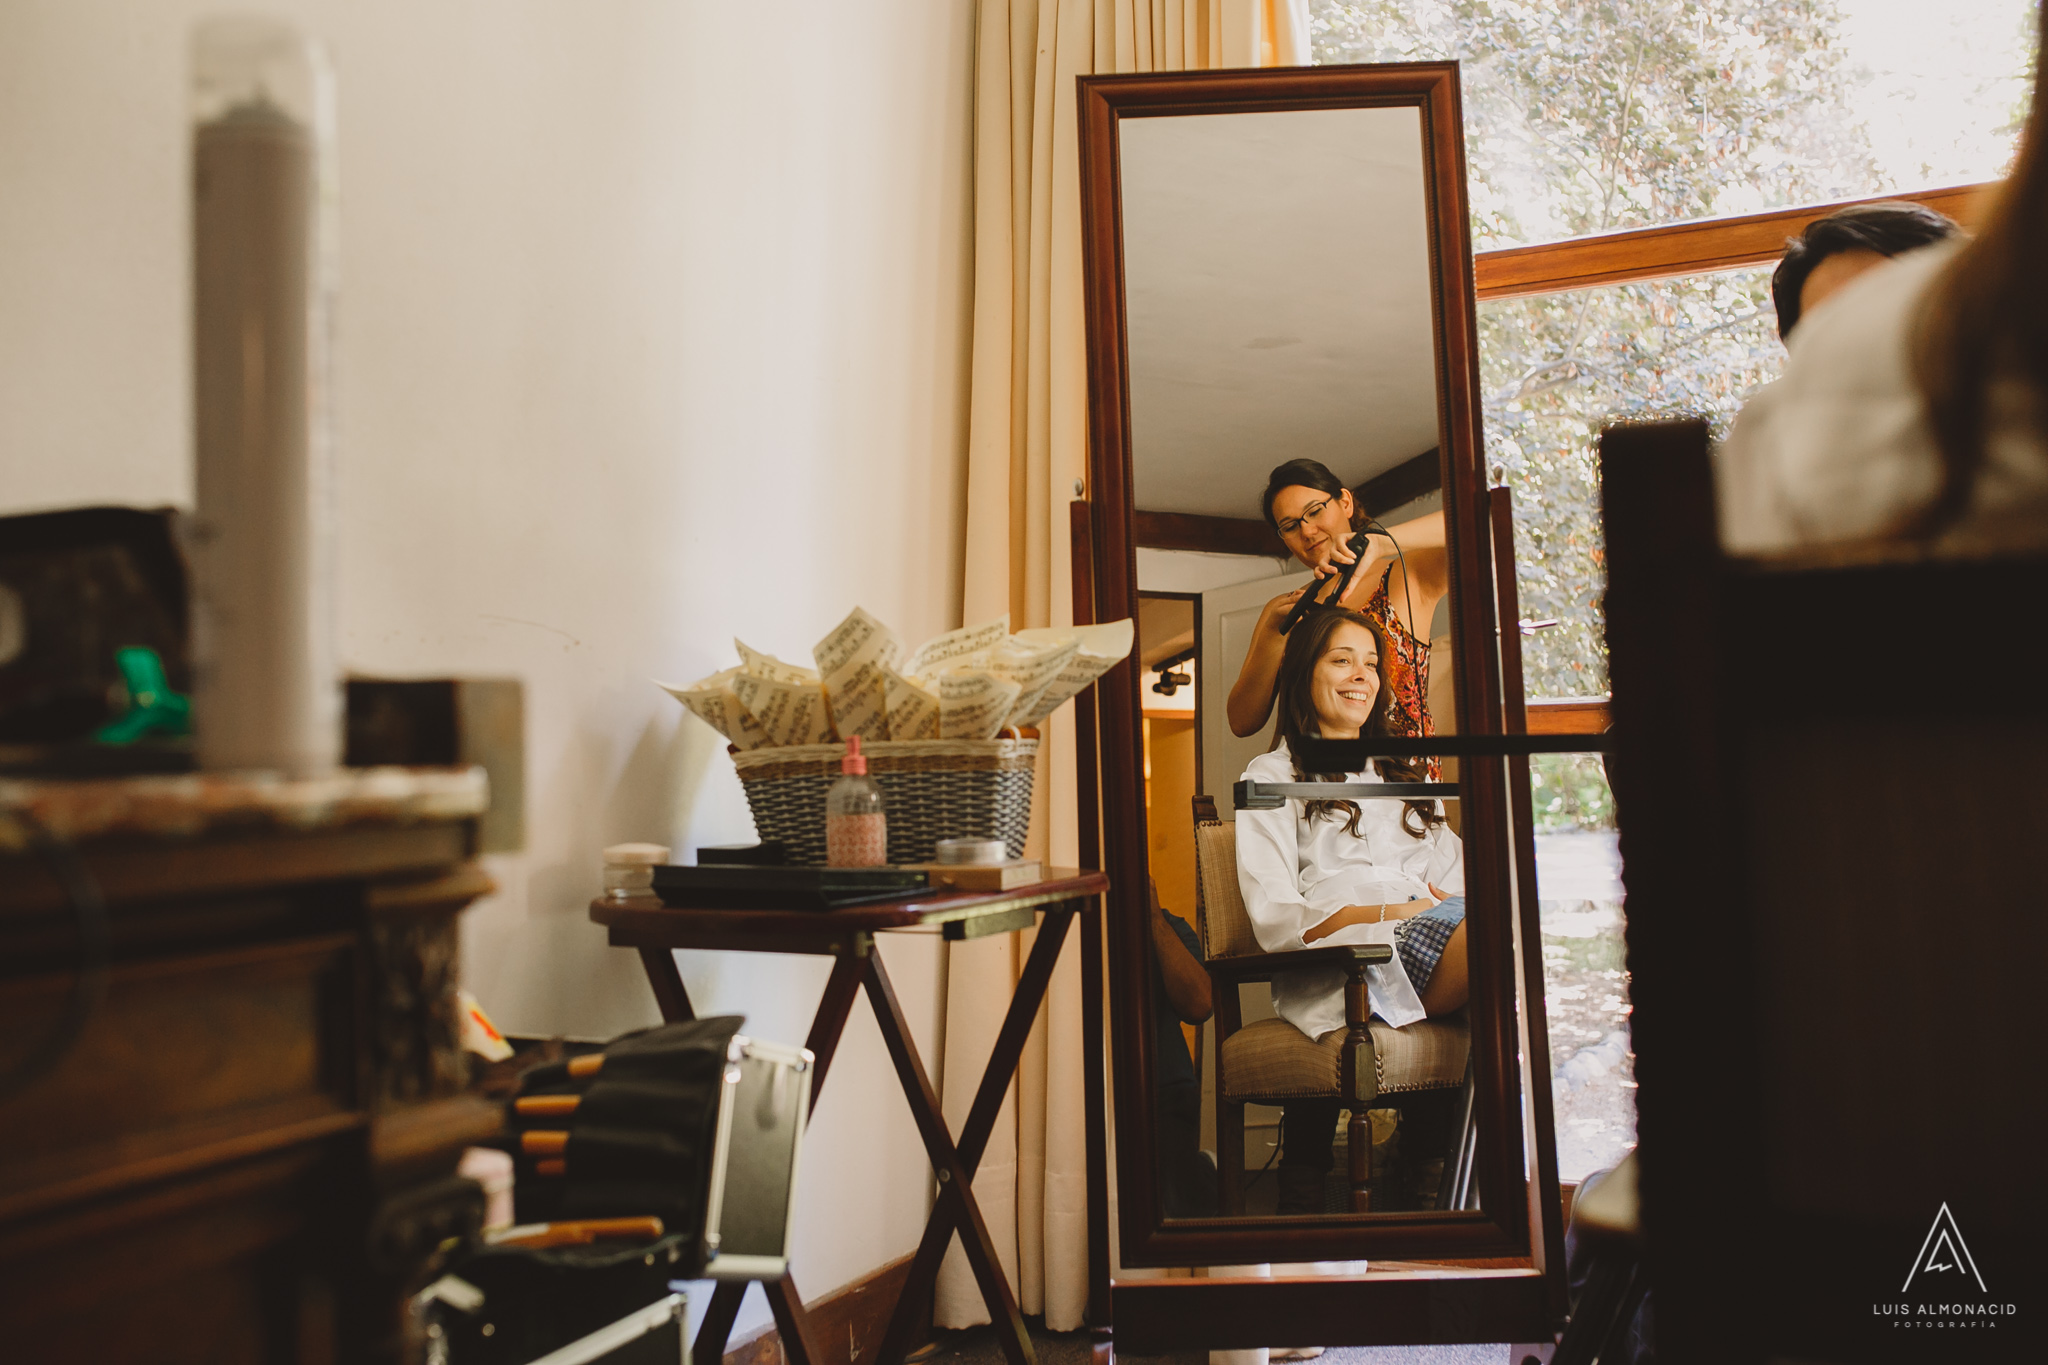 foto-matrimonio-casa-parque-nos-aire-libre